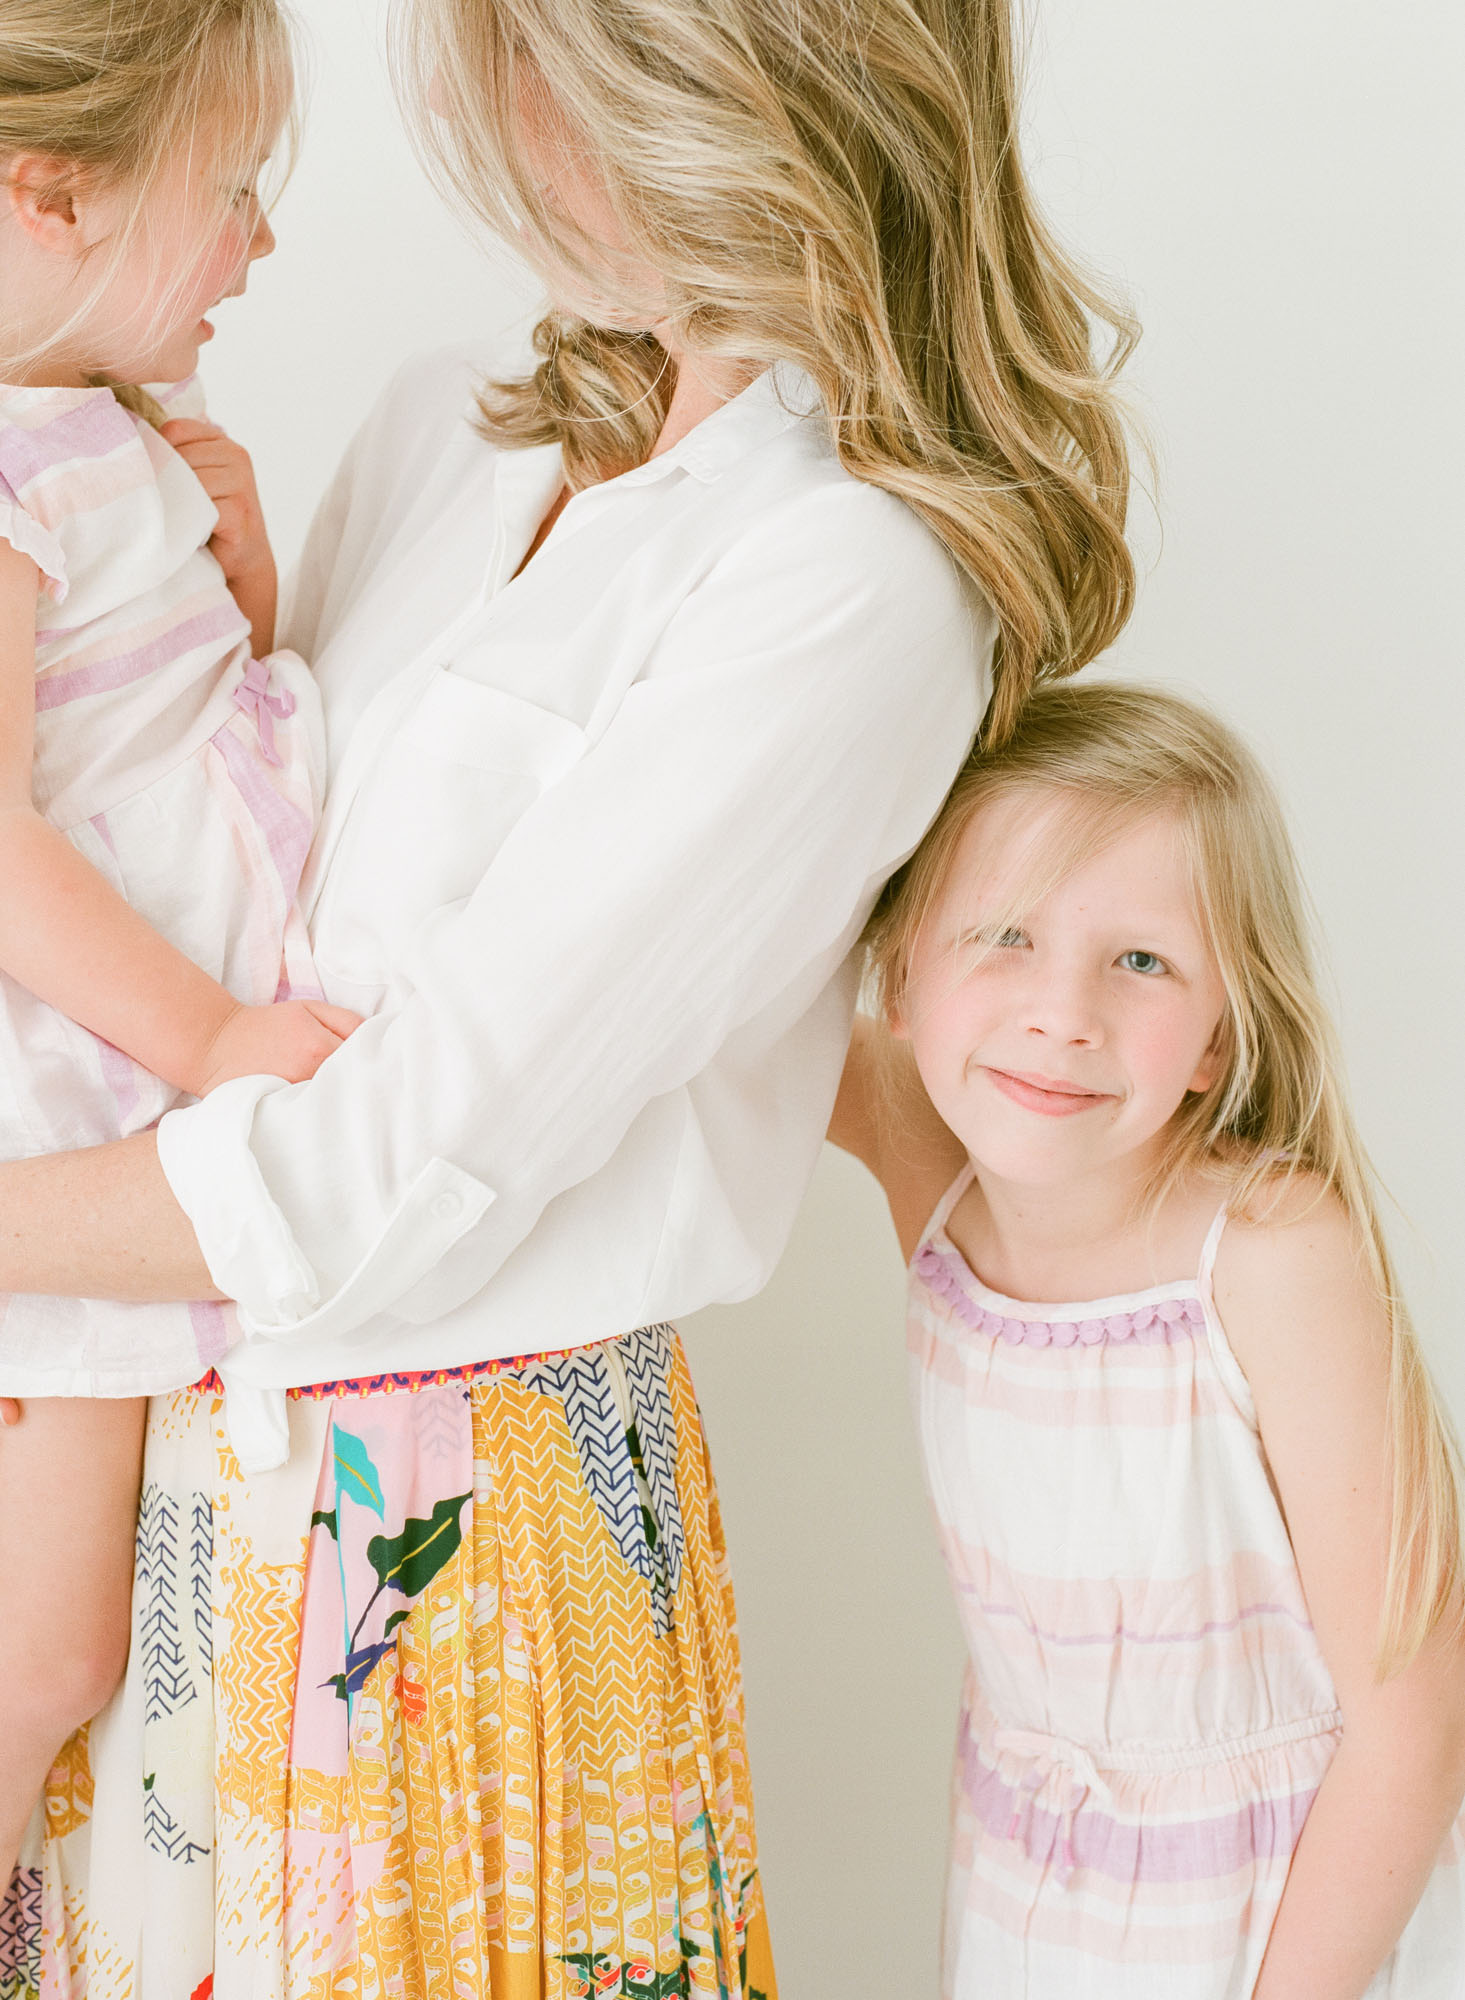 family-photographer-wake-forest-nc-motherhood-studio-portraits-004